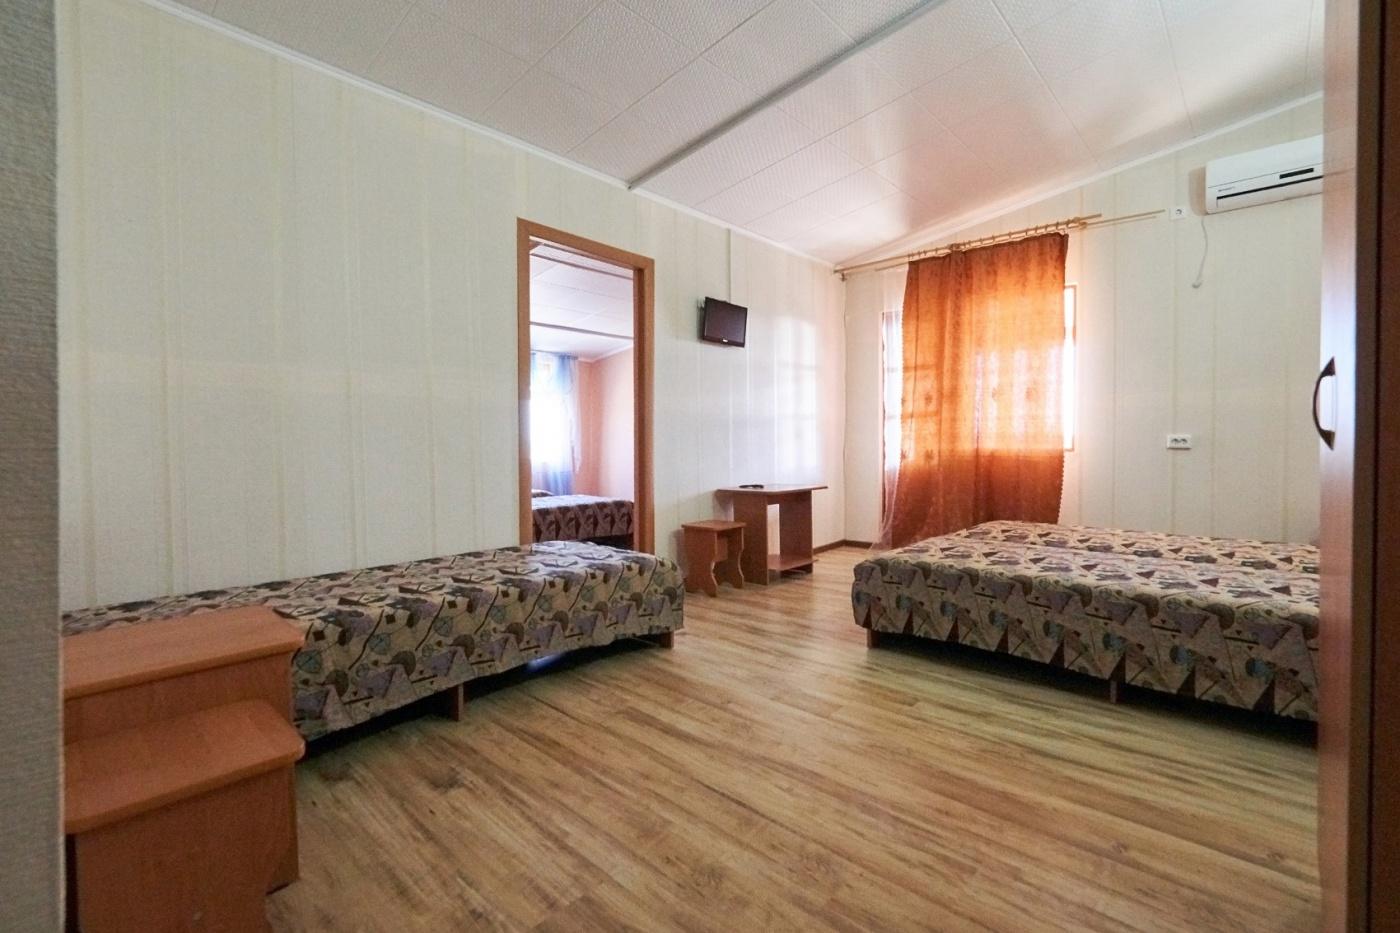 База отдыха «Ока» Краснодарский край Корпус А: 2-комнатный 5-местный номер (2х+3х) с большим балконом, фото 2